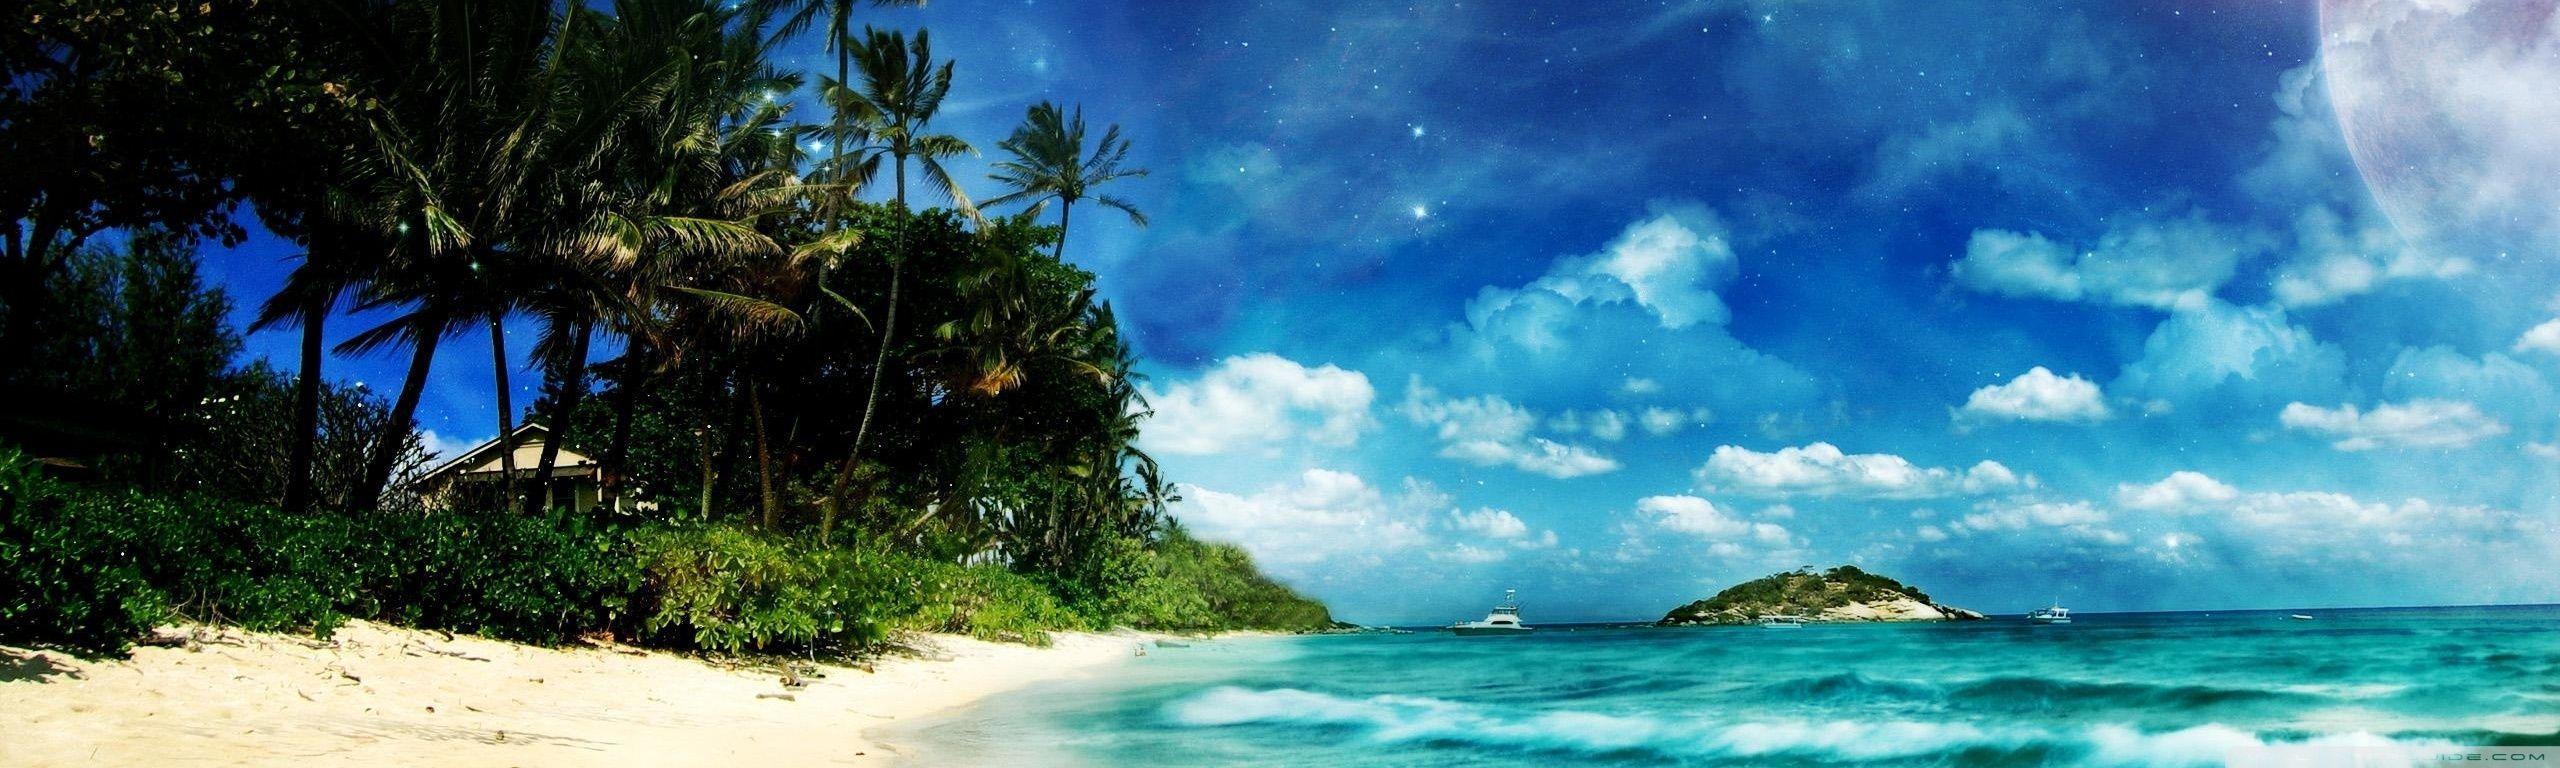 4K Dual Monitor Beach Wallpapers - Top Free 4K Dual ...